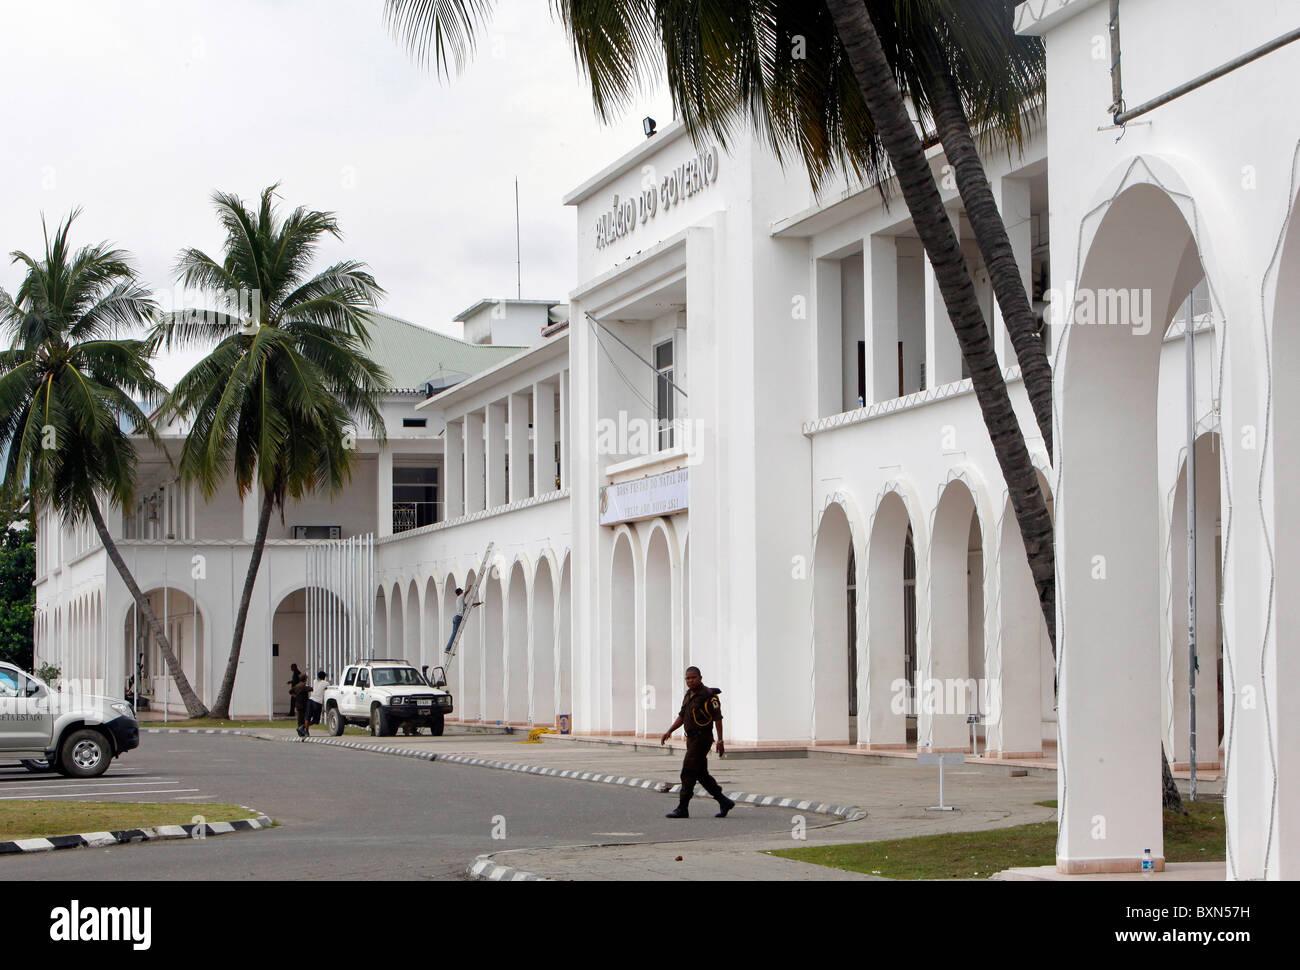 Der Palacio Governo (Regierungspalast) in Dili, Hauptstadt von Timor-Leste (Osttimor) Stockbild